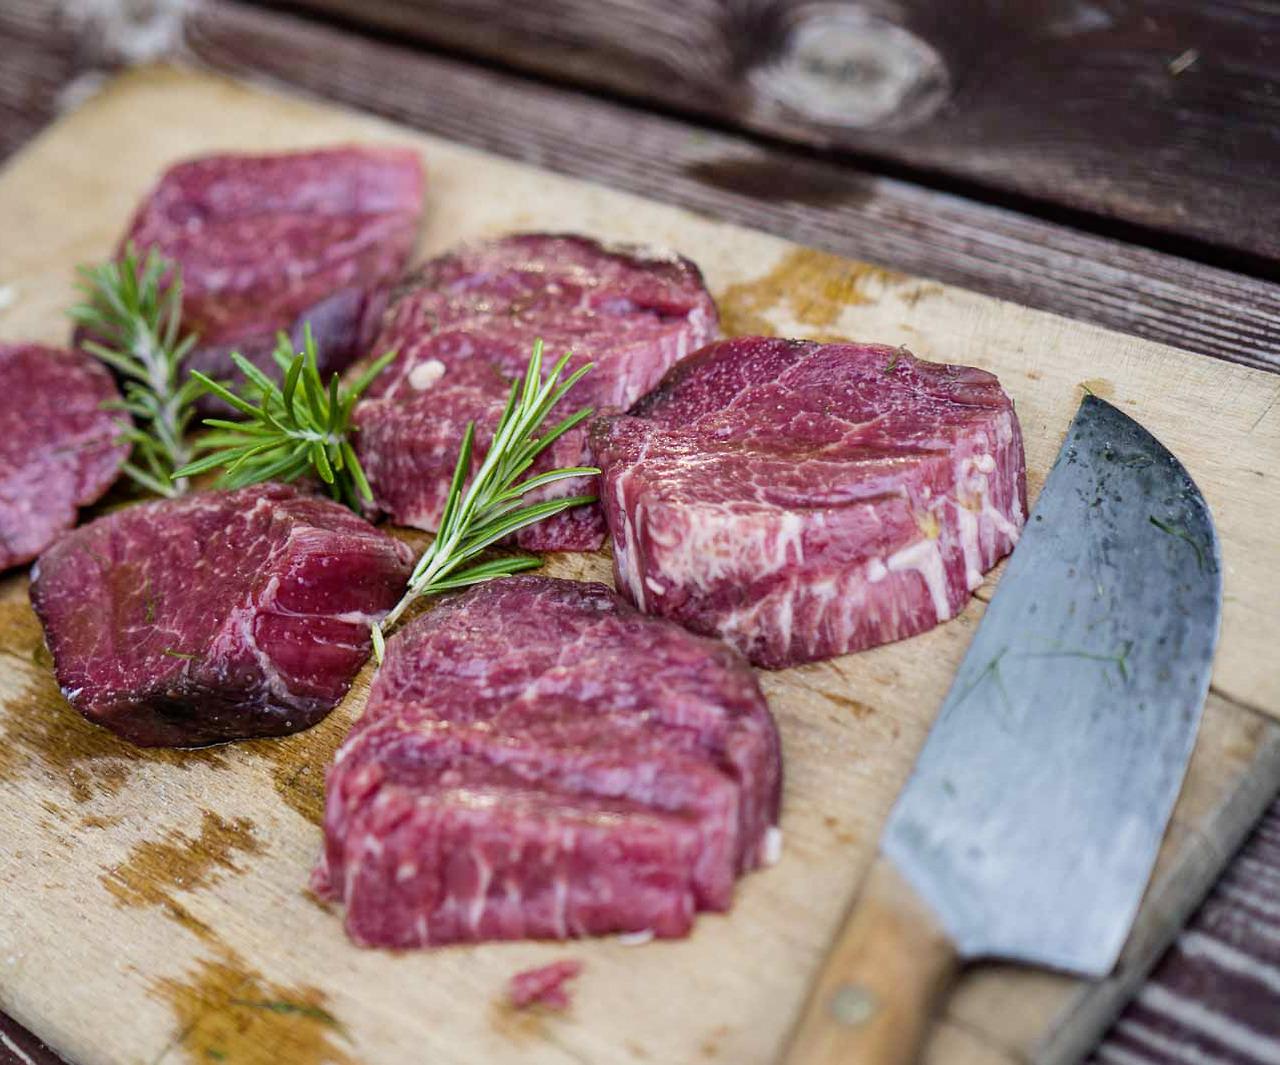 juicy beef tenderloin, perfectly grilled. 🐂🍴😋